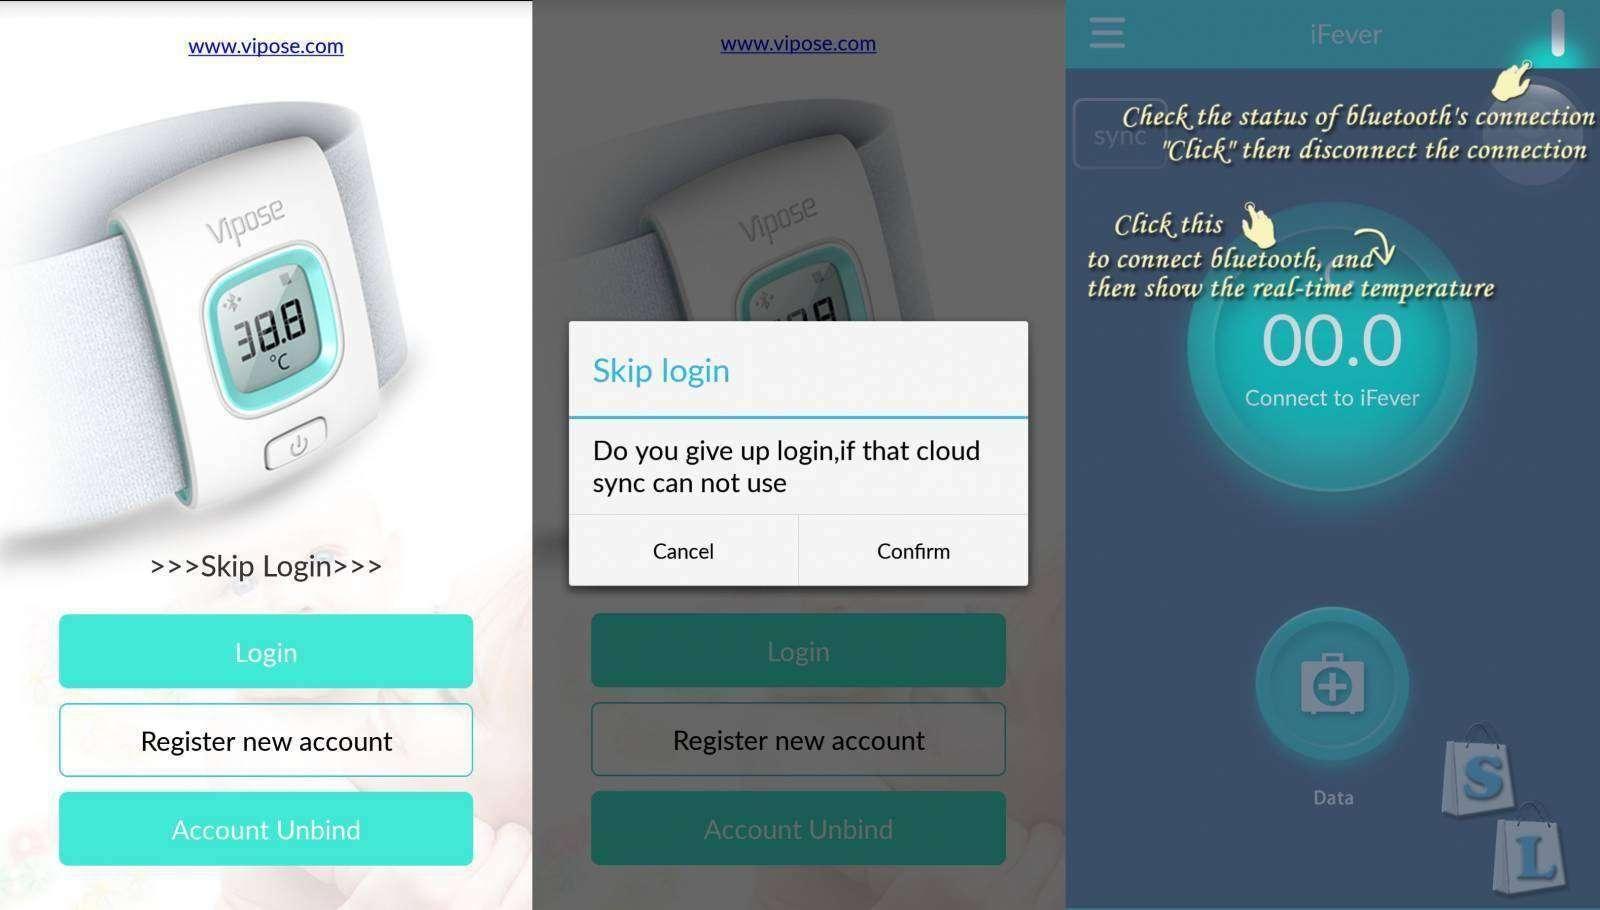 EachBuyer: Цифровой  Bluetooth термометр Vipose iFever мониторинг температуры тела ребенка